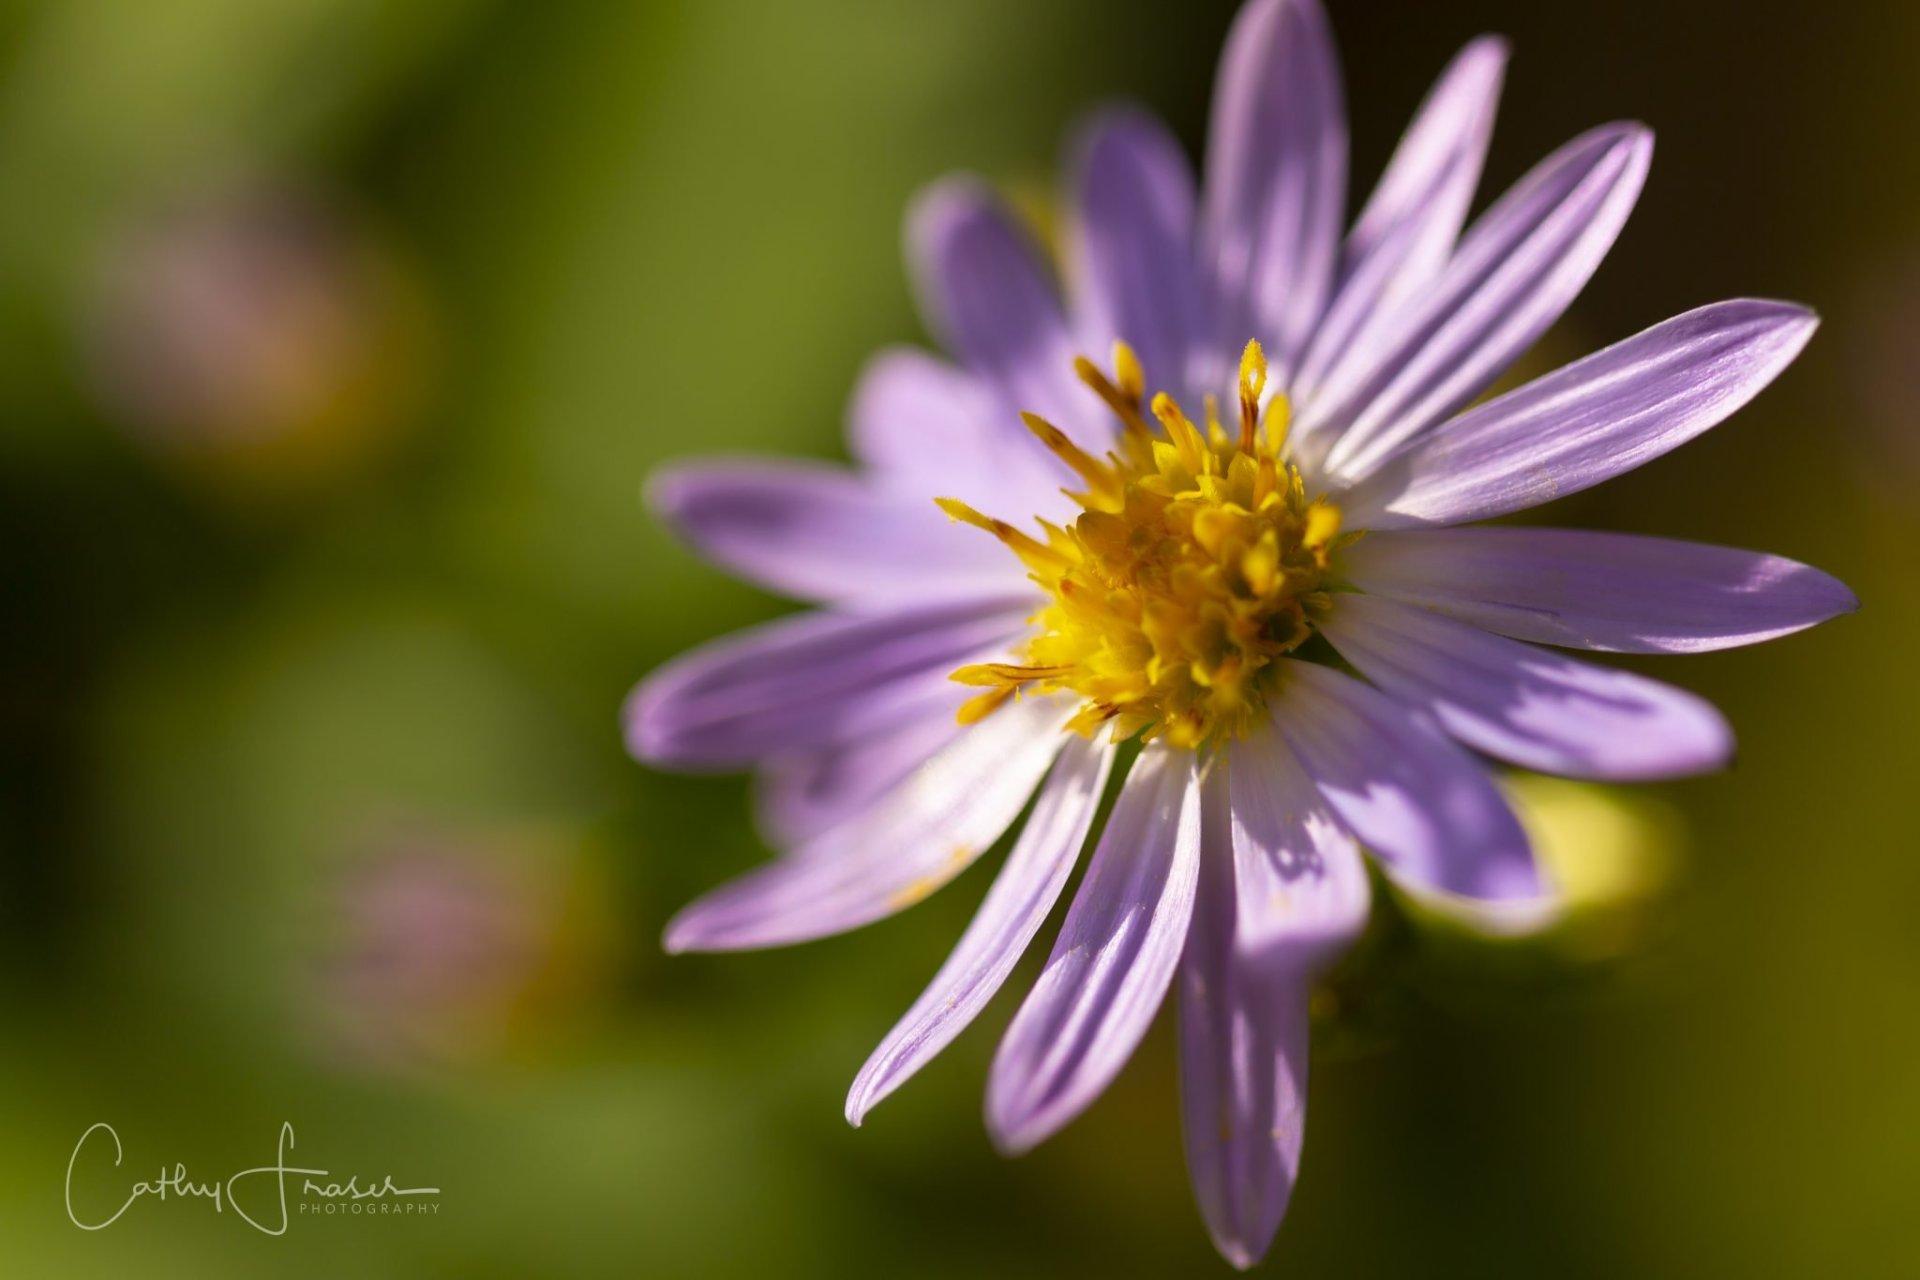 landscape photography of a purple flower